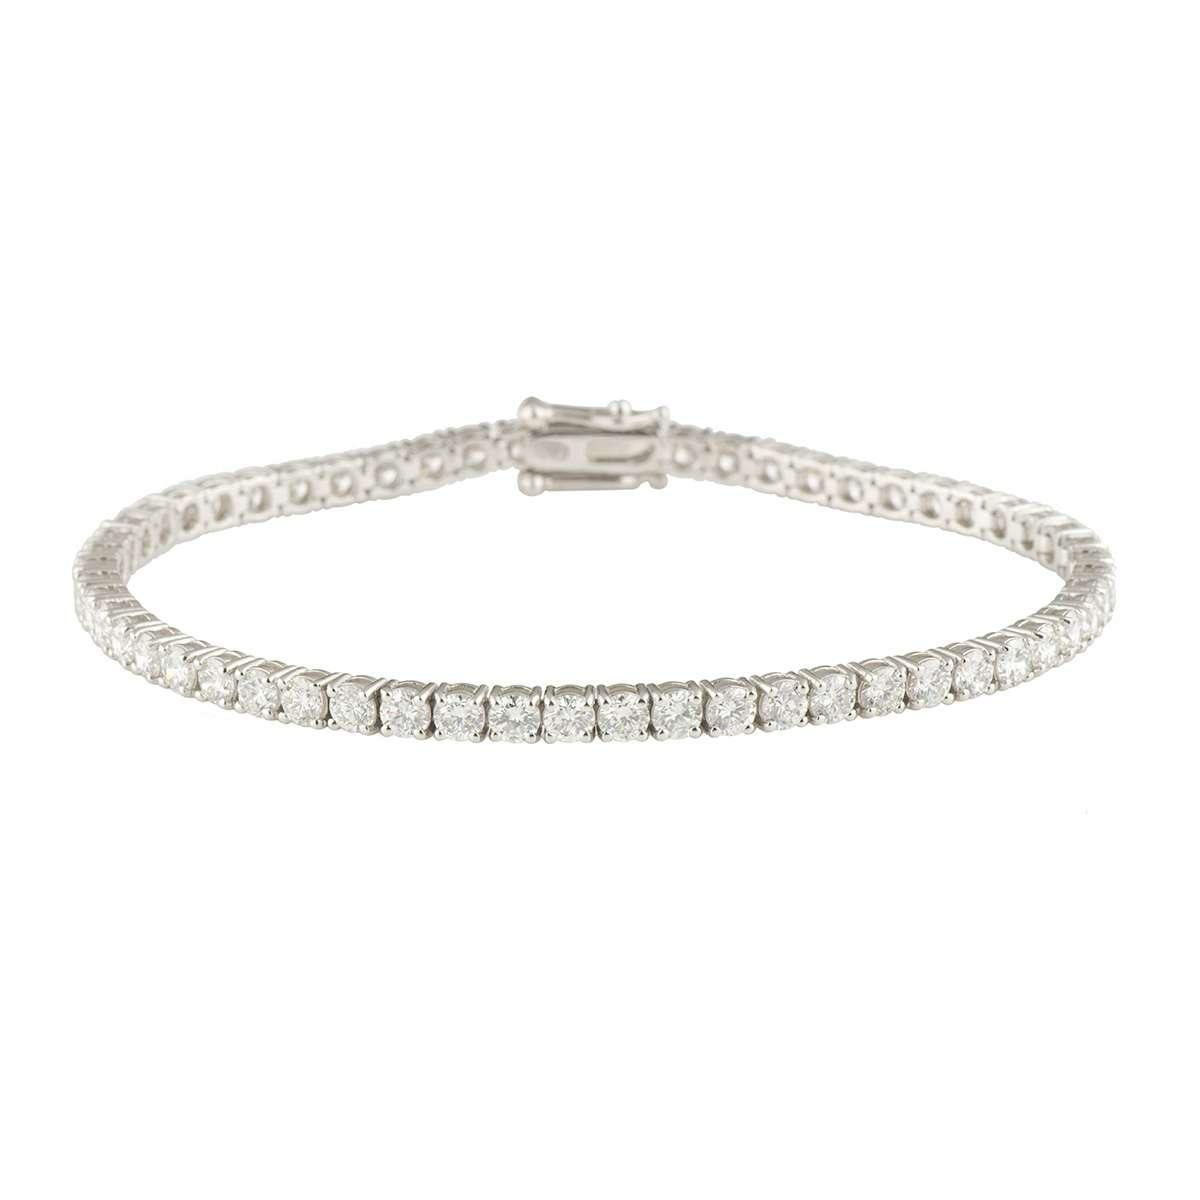 White Gold Diamond Line Bracelet 5.61ct